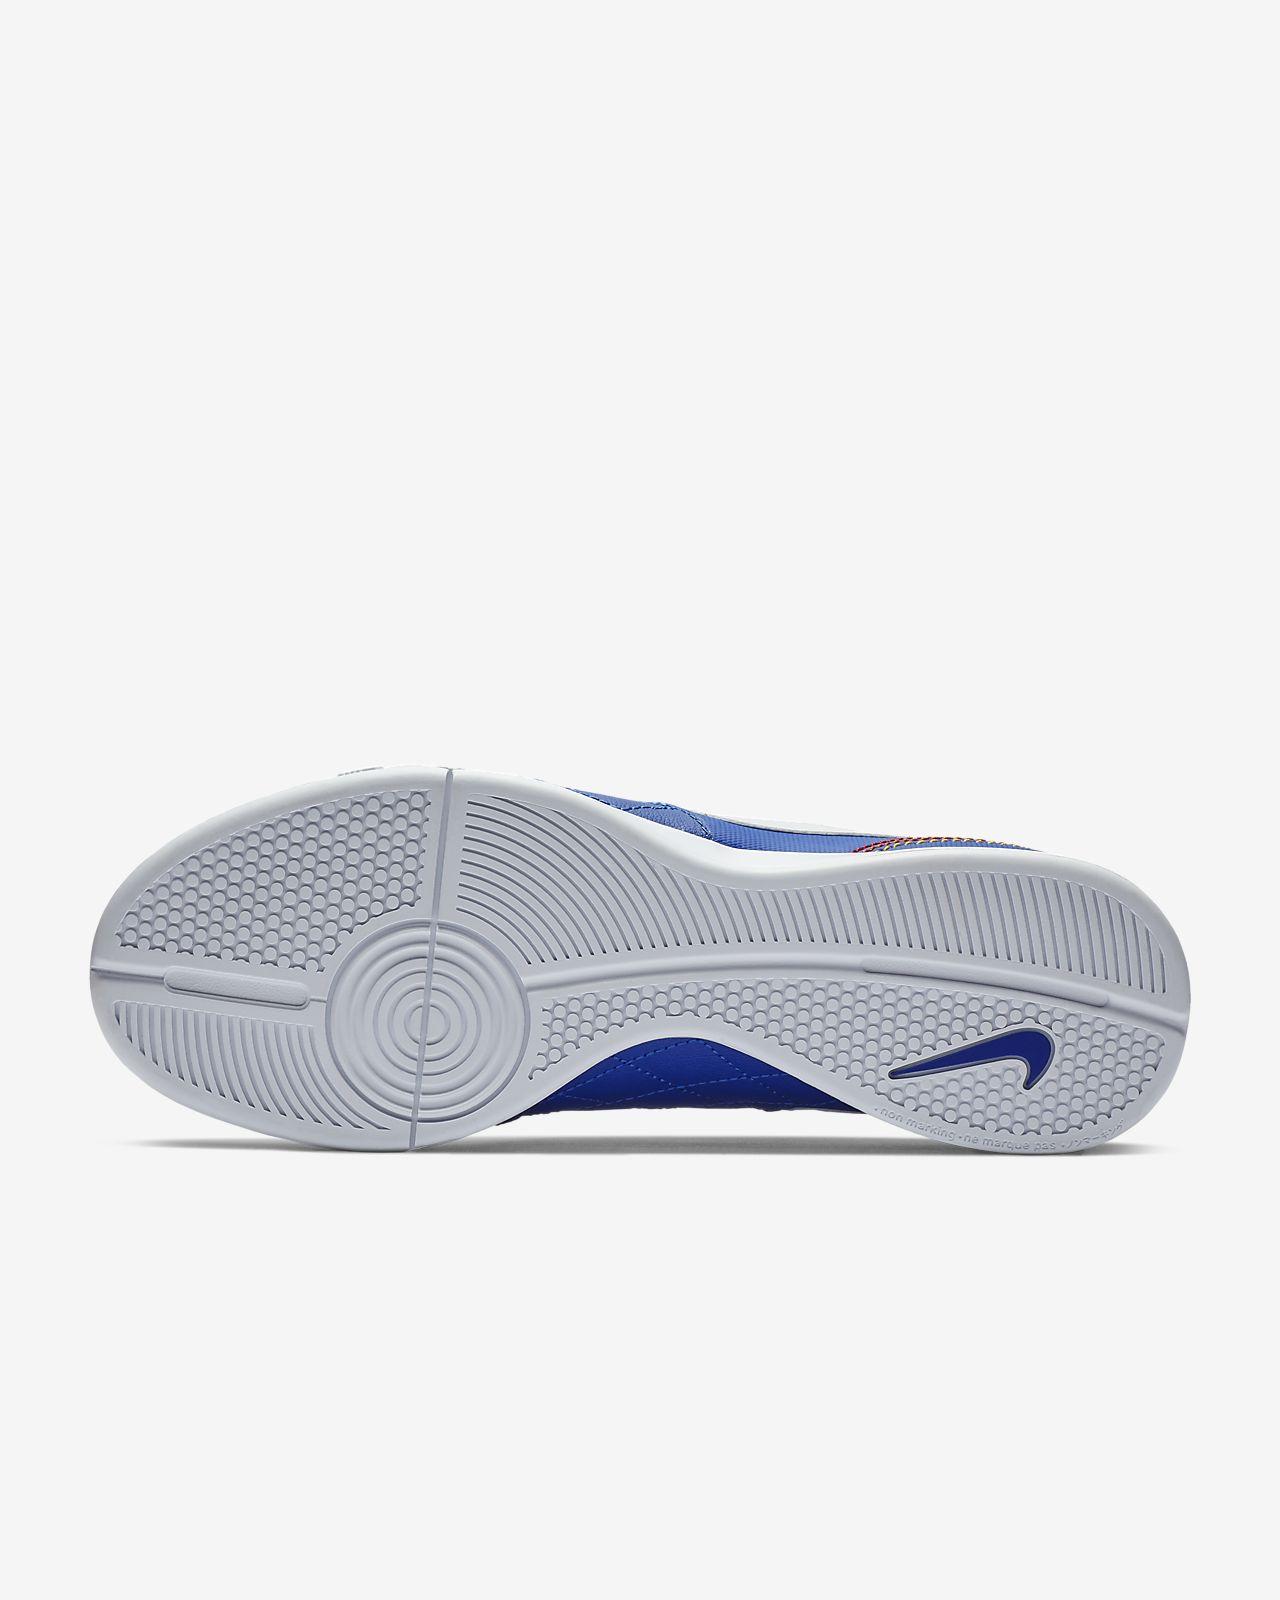 b56882c29c29 Nike TiempoX Legend VII Academy 10R Indoor/Court Football Shoe. Nike ...